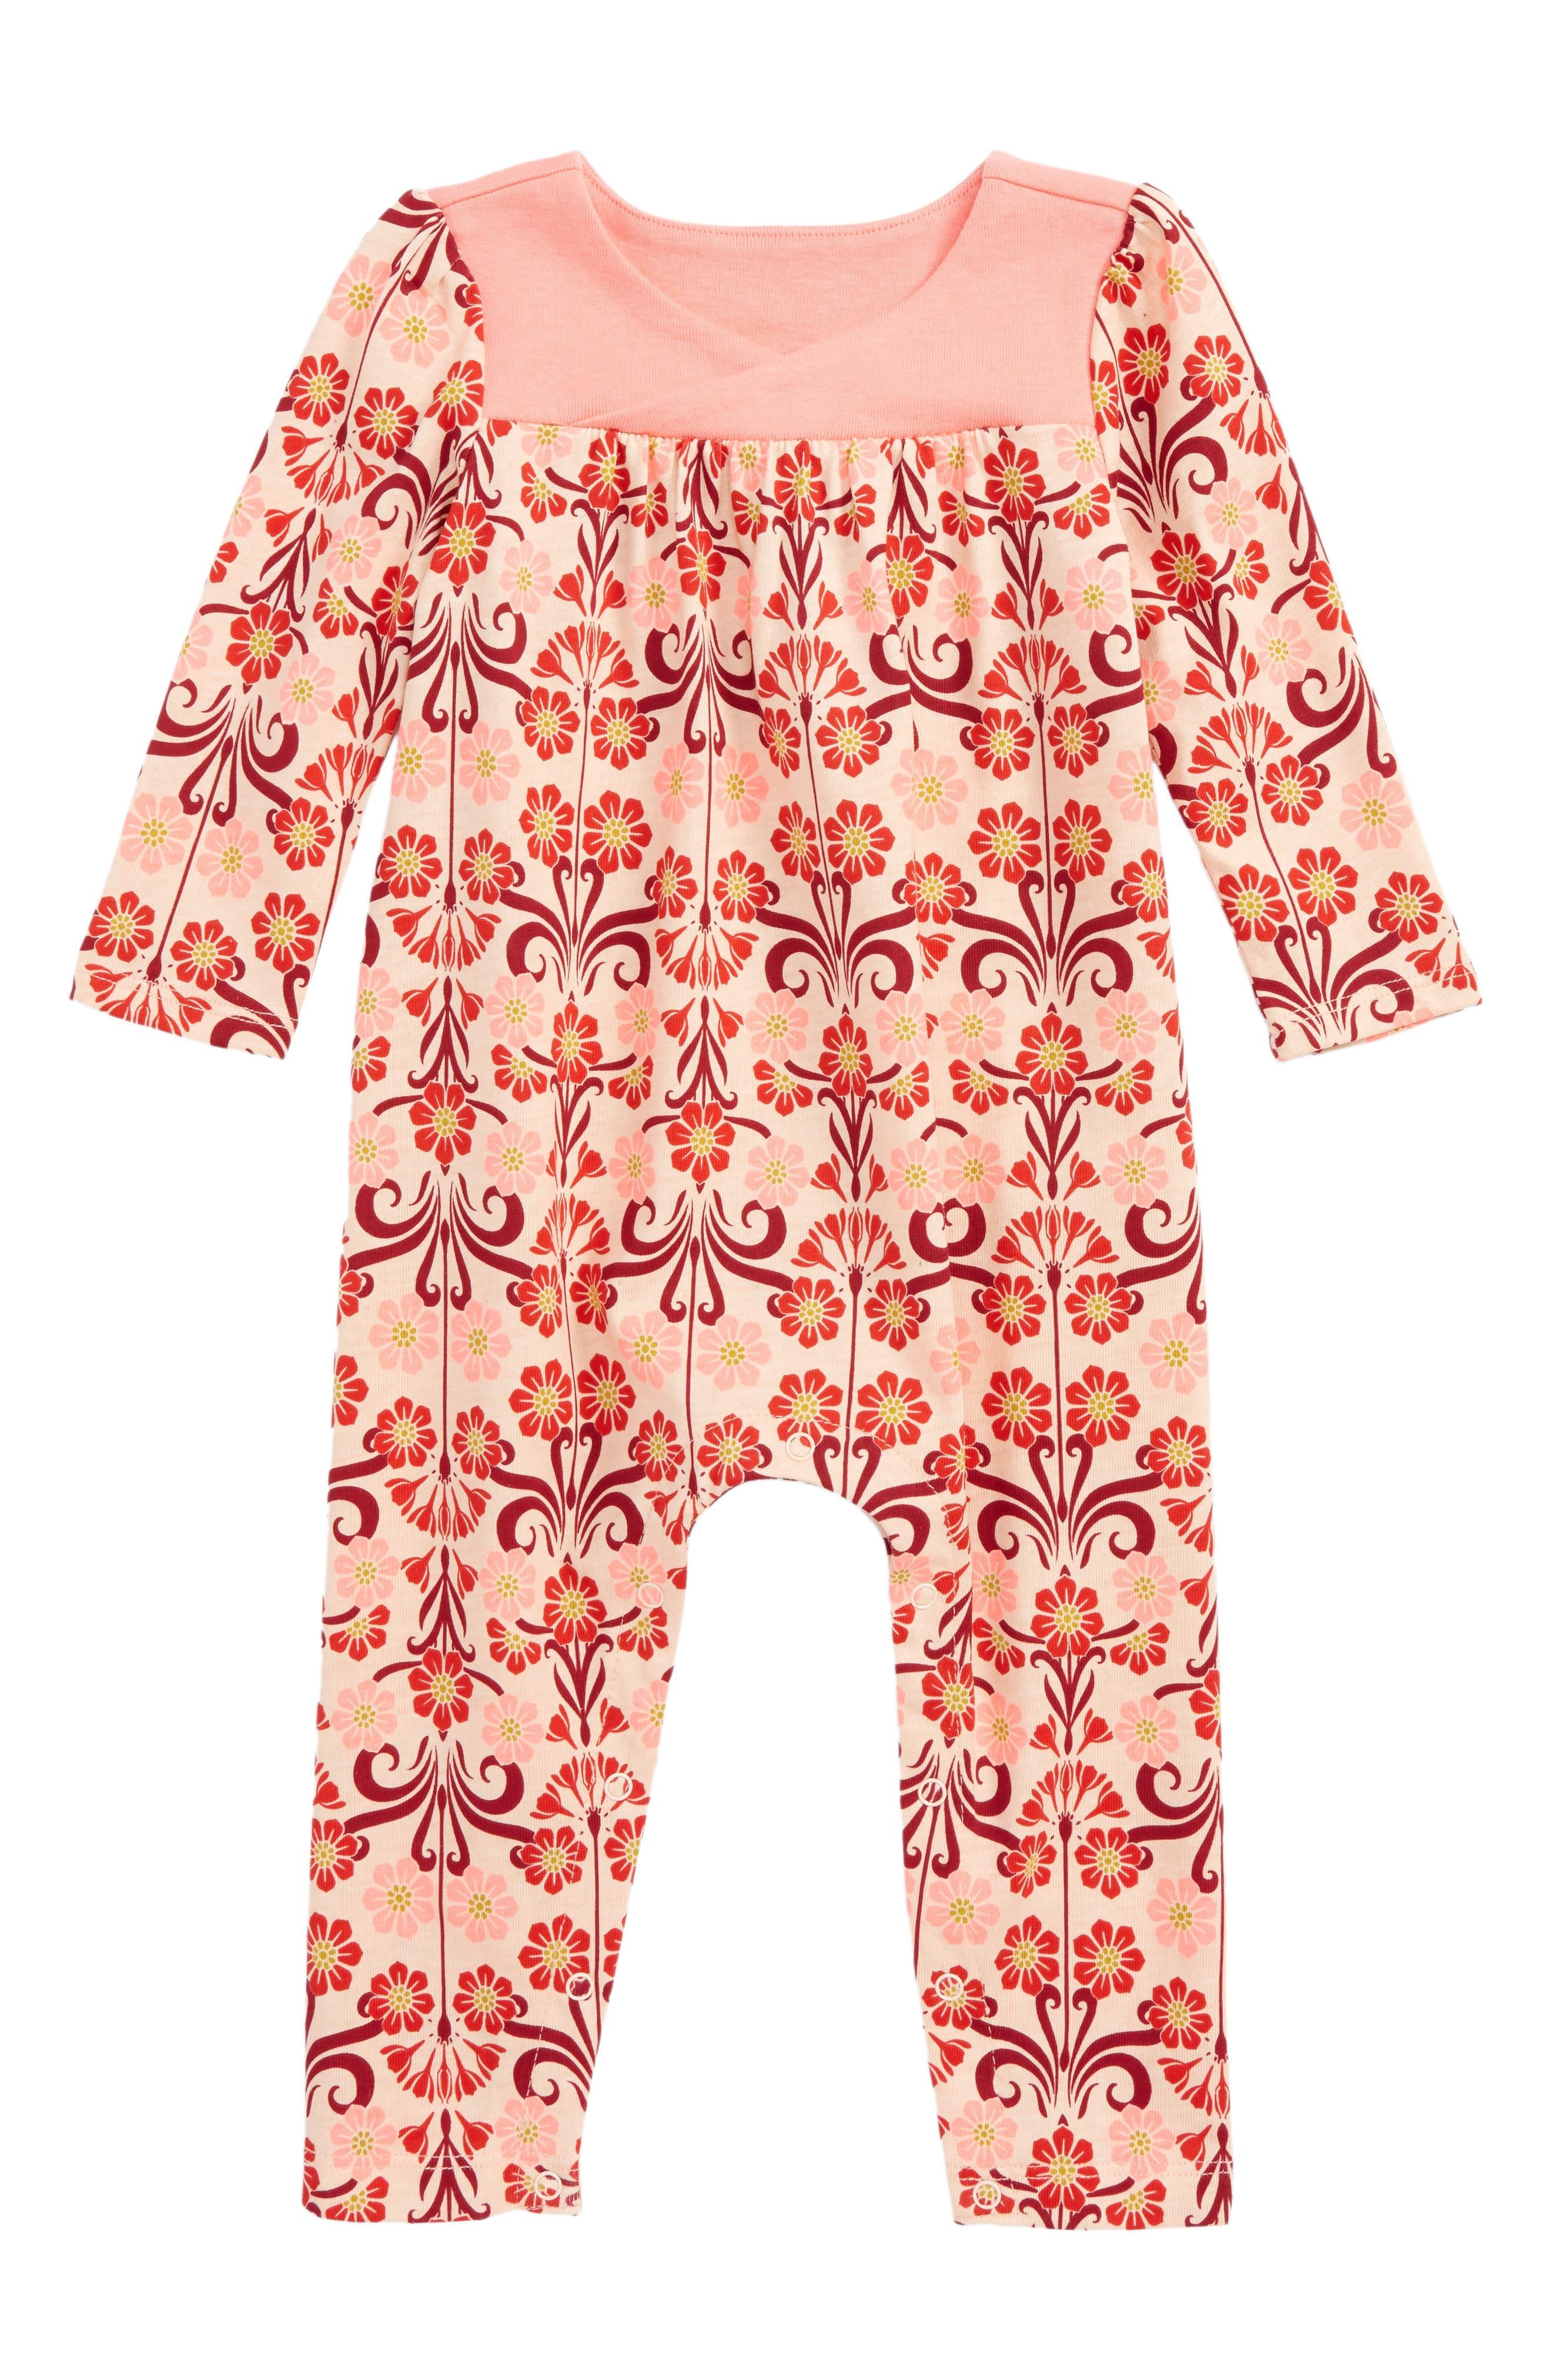 Dahlia Romper,                         Main,                         color, Soft Peach